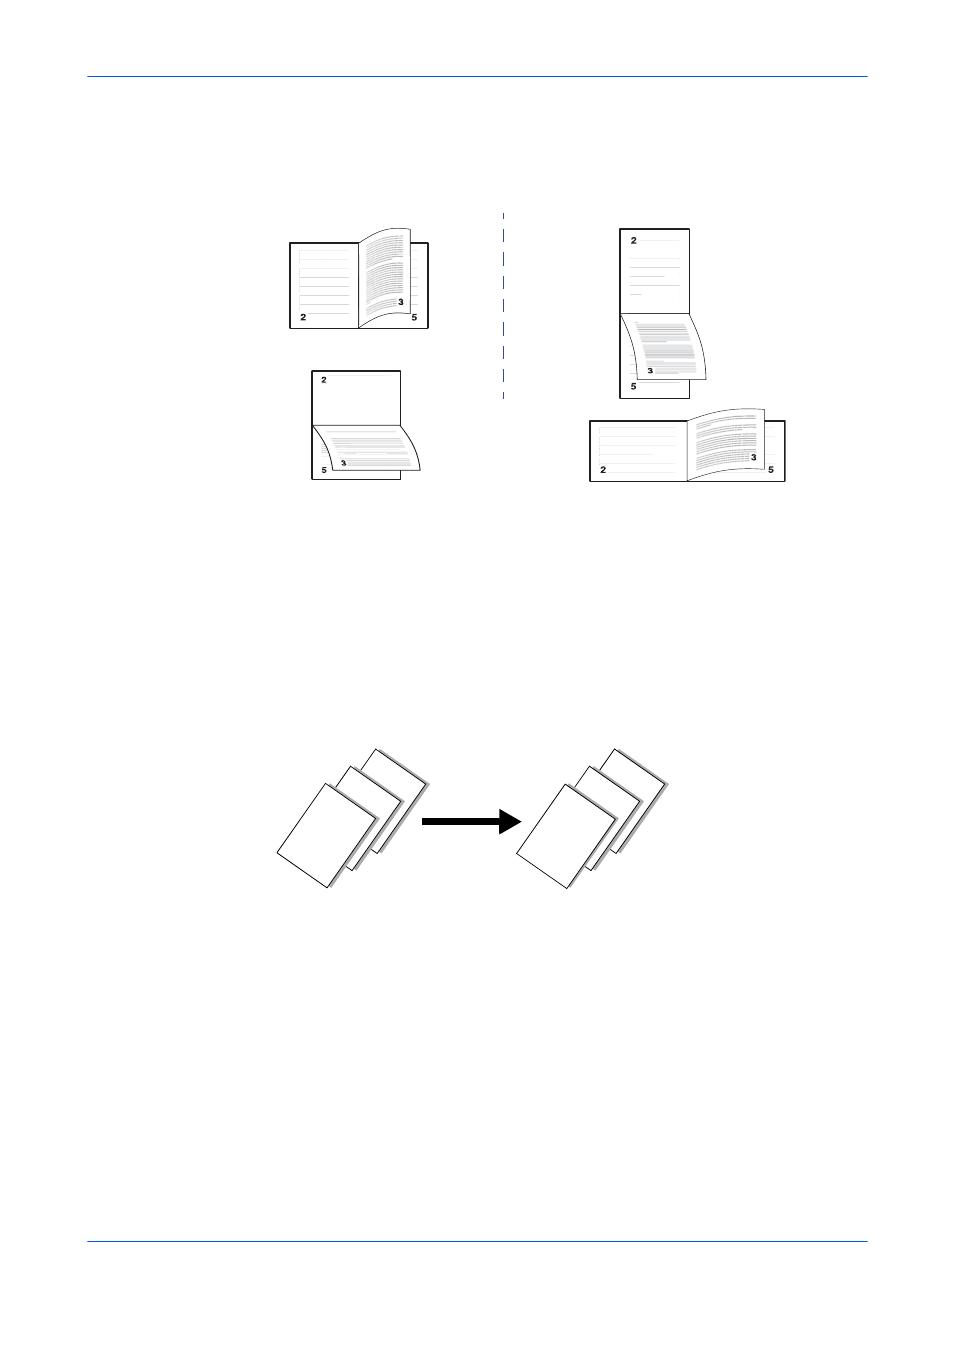 Kyocera Manual Printer Price Per Unit Printed Circuit Board And Panel Fits Gilbarco Encore Array Reverse Order Printing Fs 820 User Page 32 105 Rh Manualsdir Com